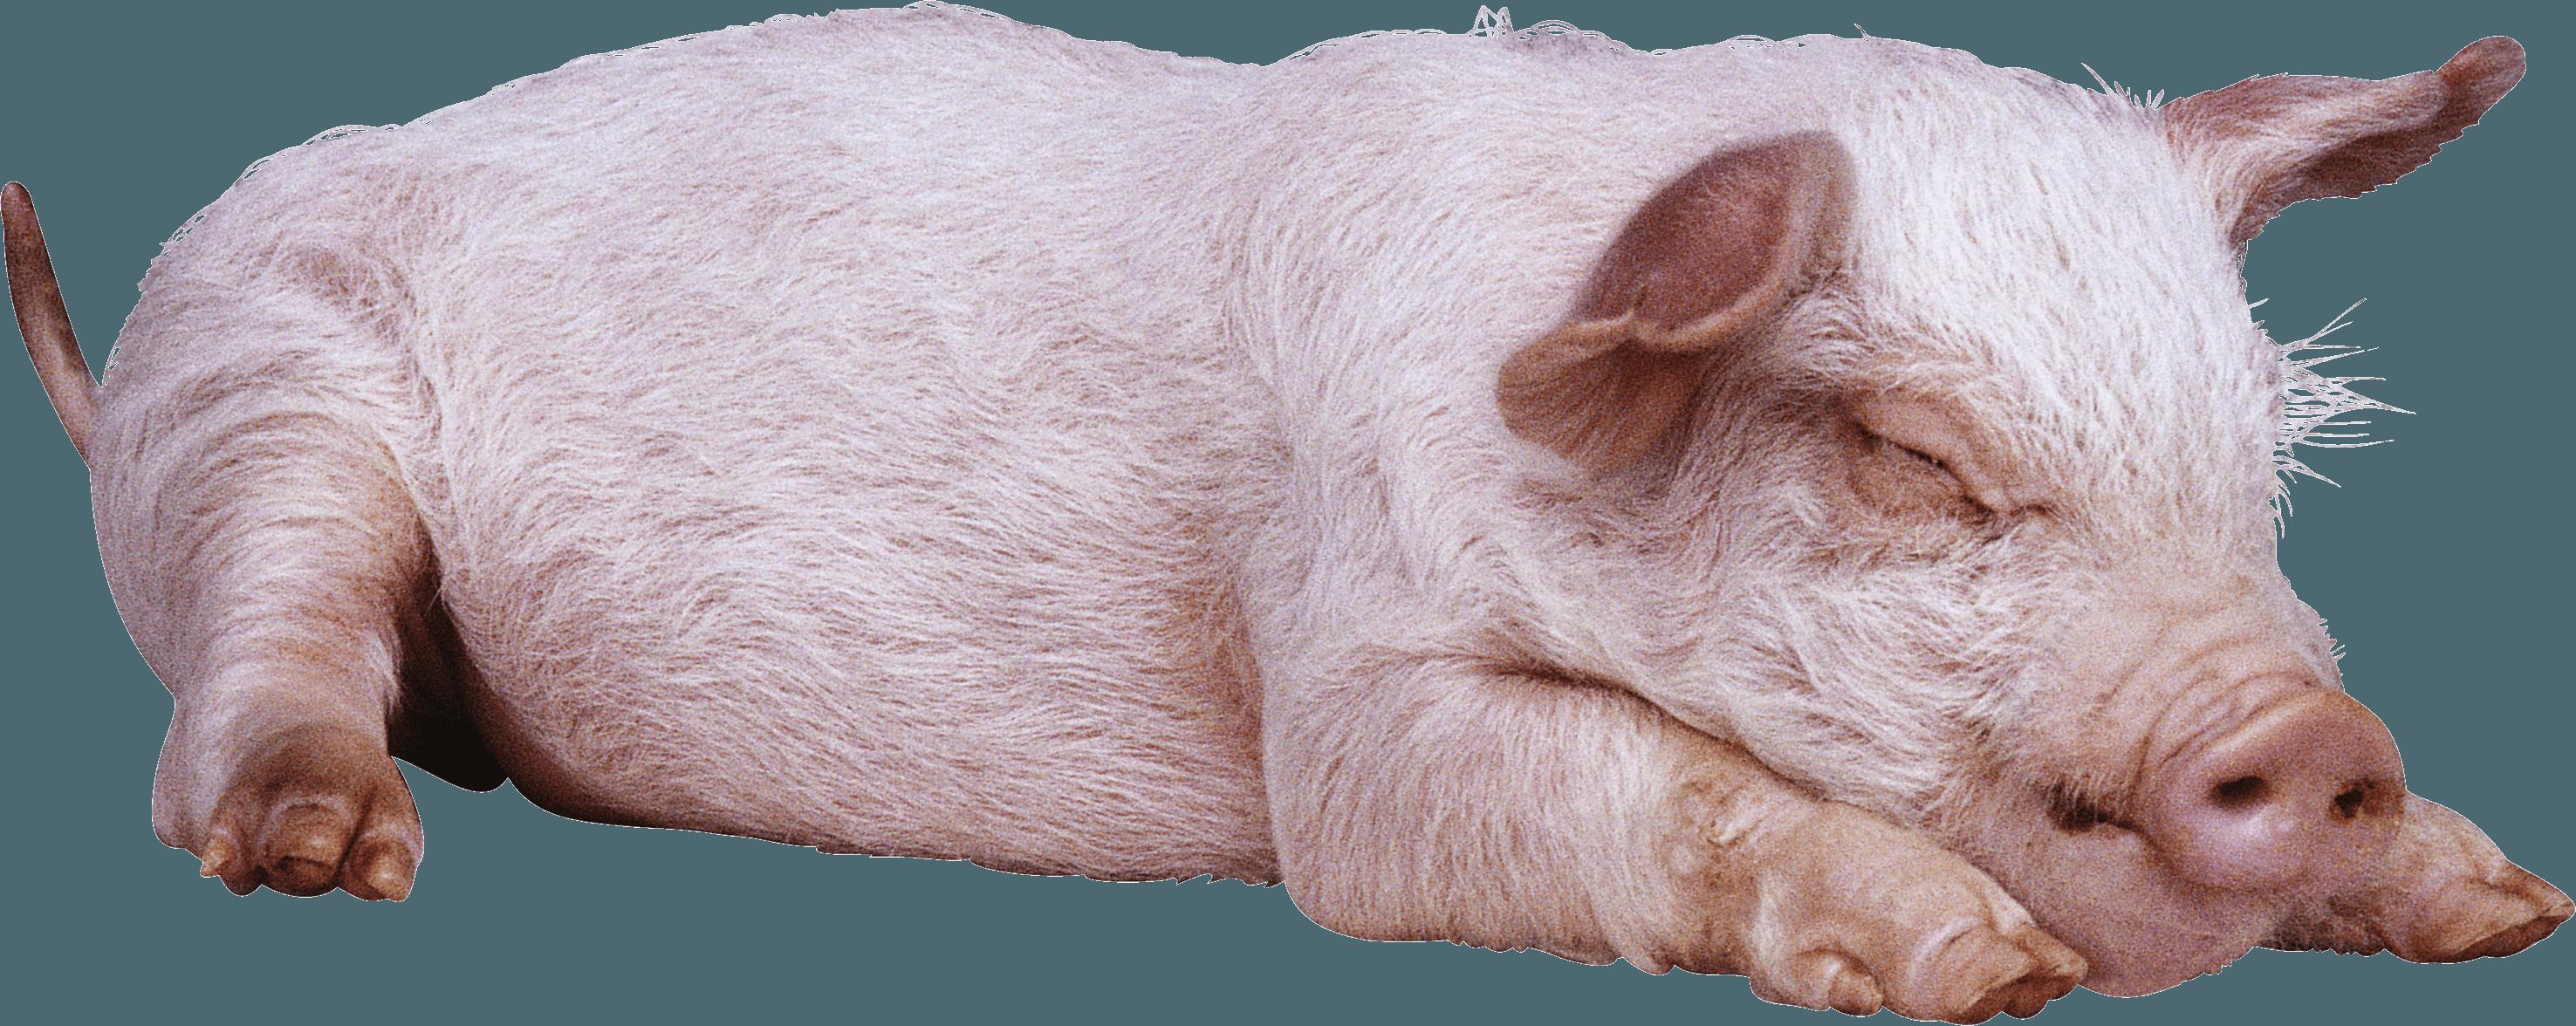 Pig PNG-PlusPNG.com-2952 - Pig PNG